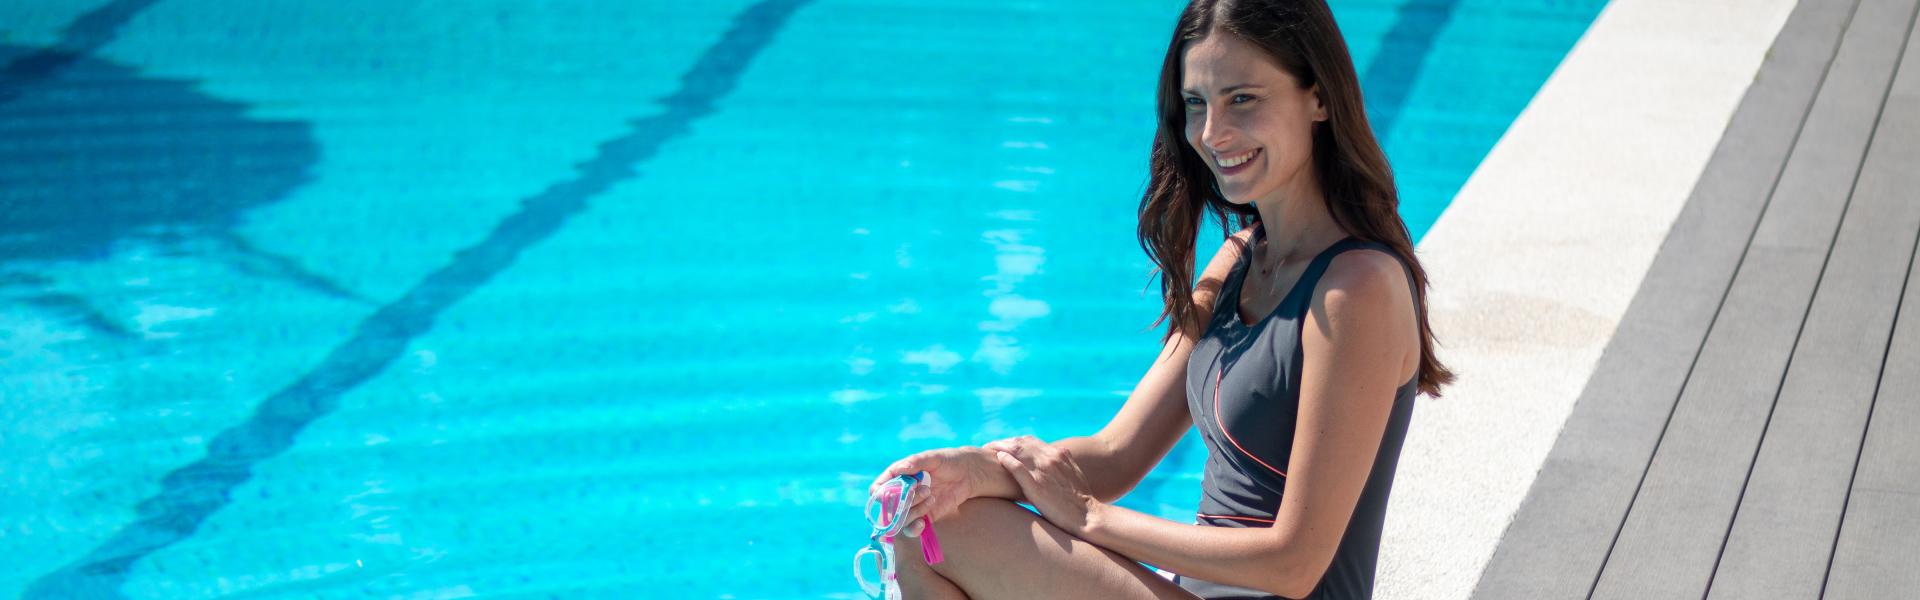 How swimming benefits mental health